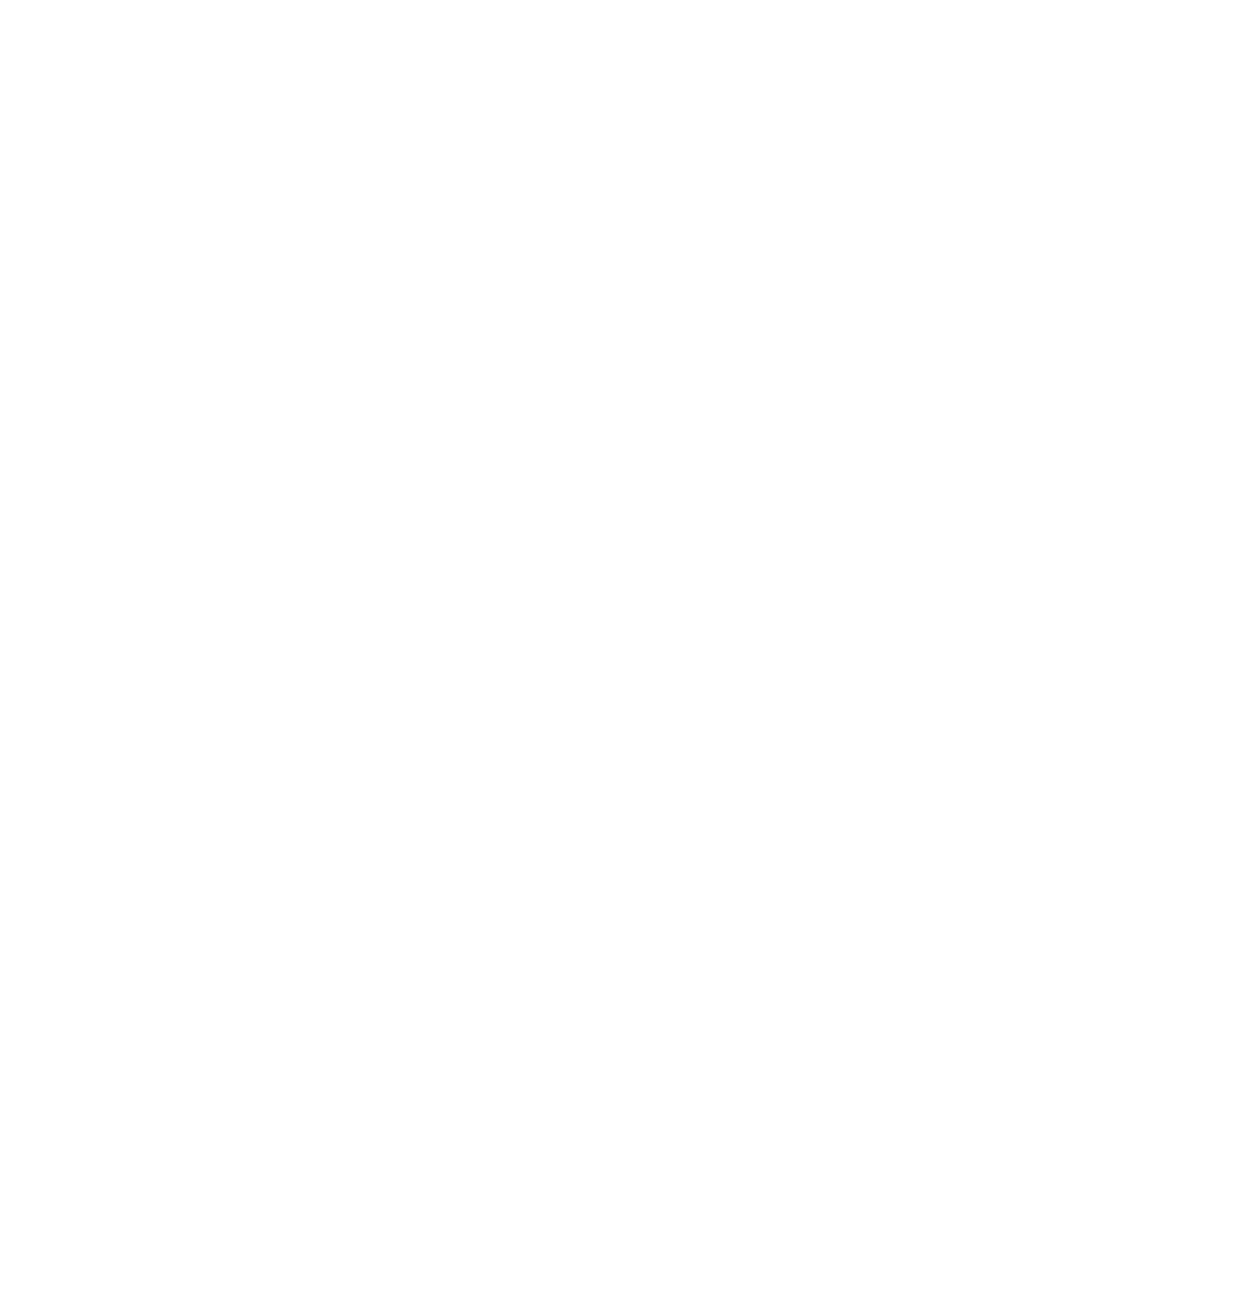 Roar Out - Web Design